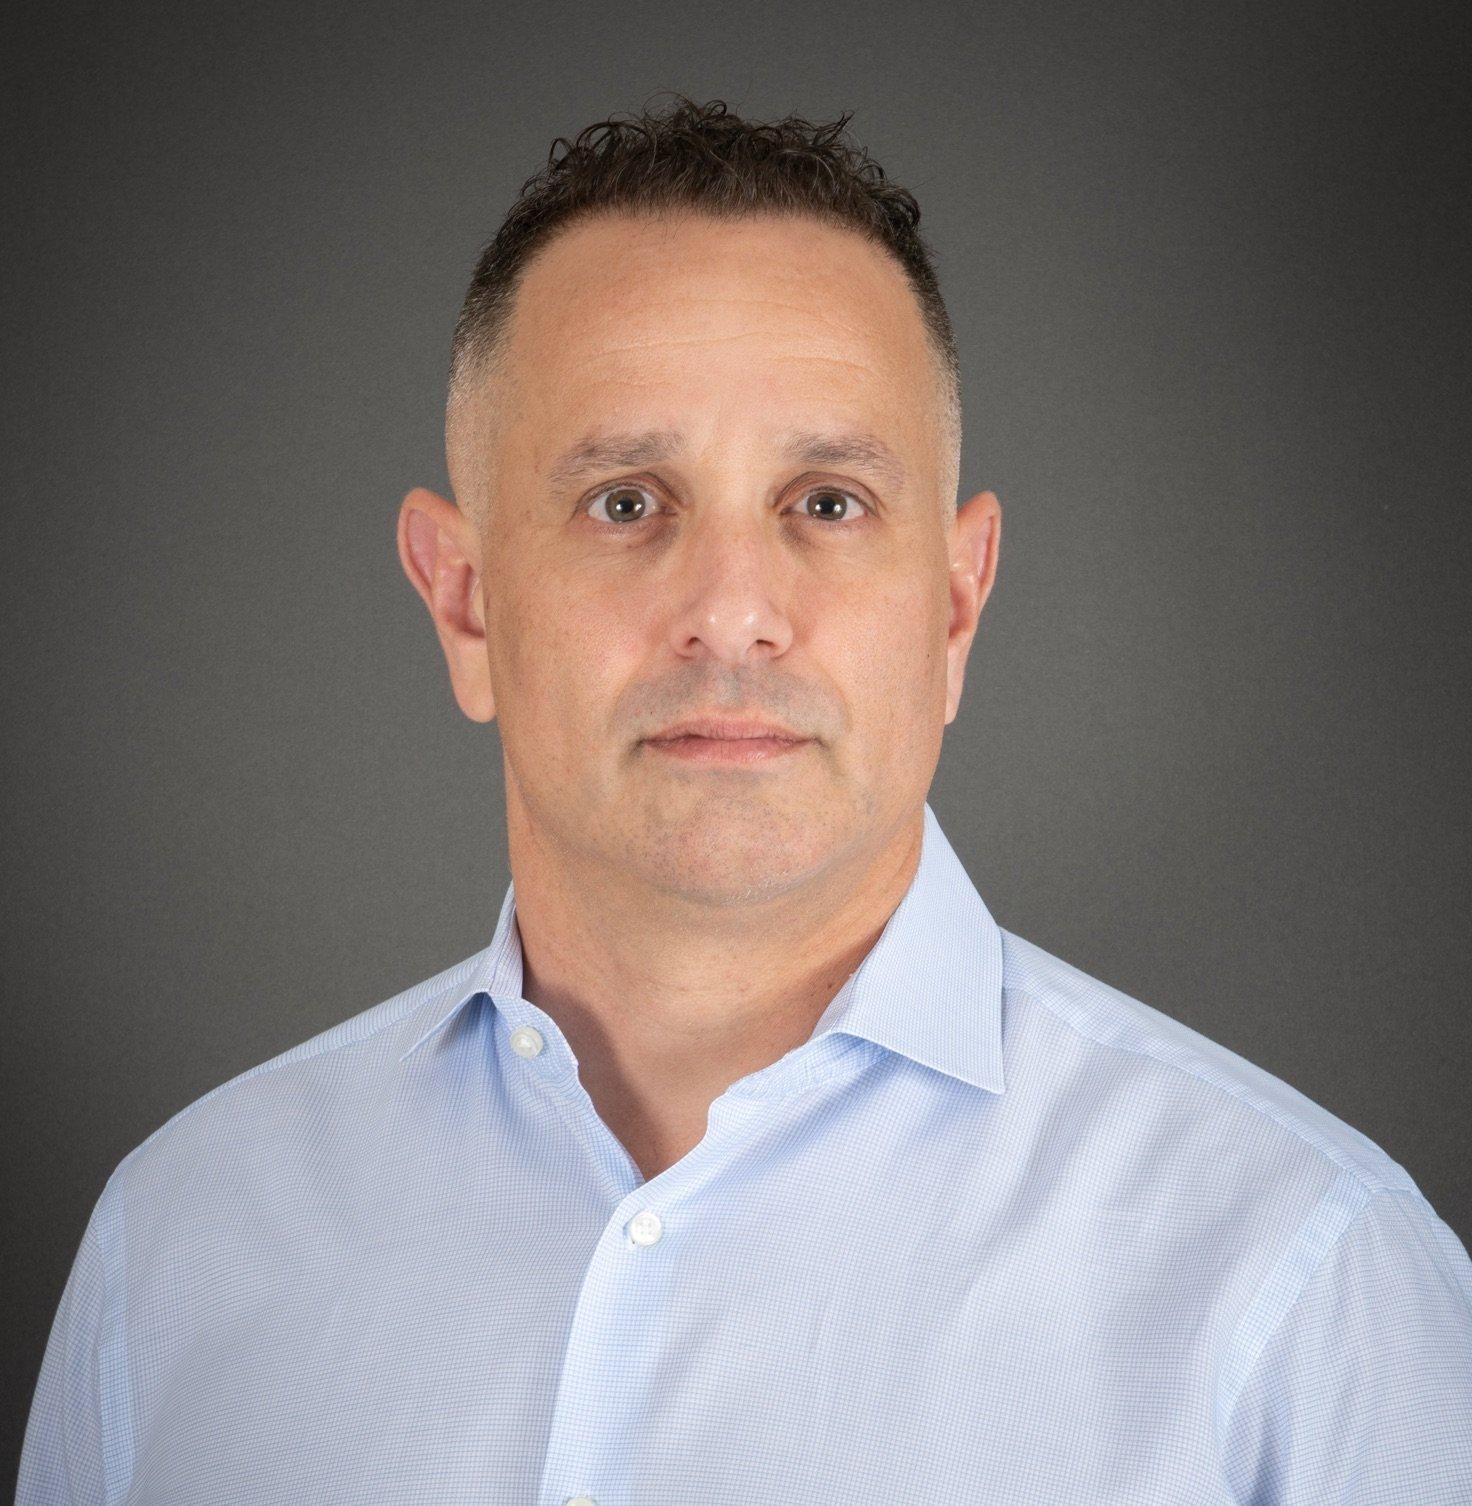 Assaf Zipori, Corporate Development and Strategy